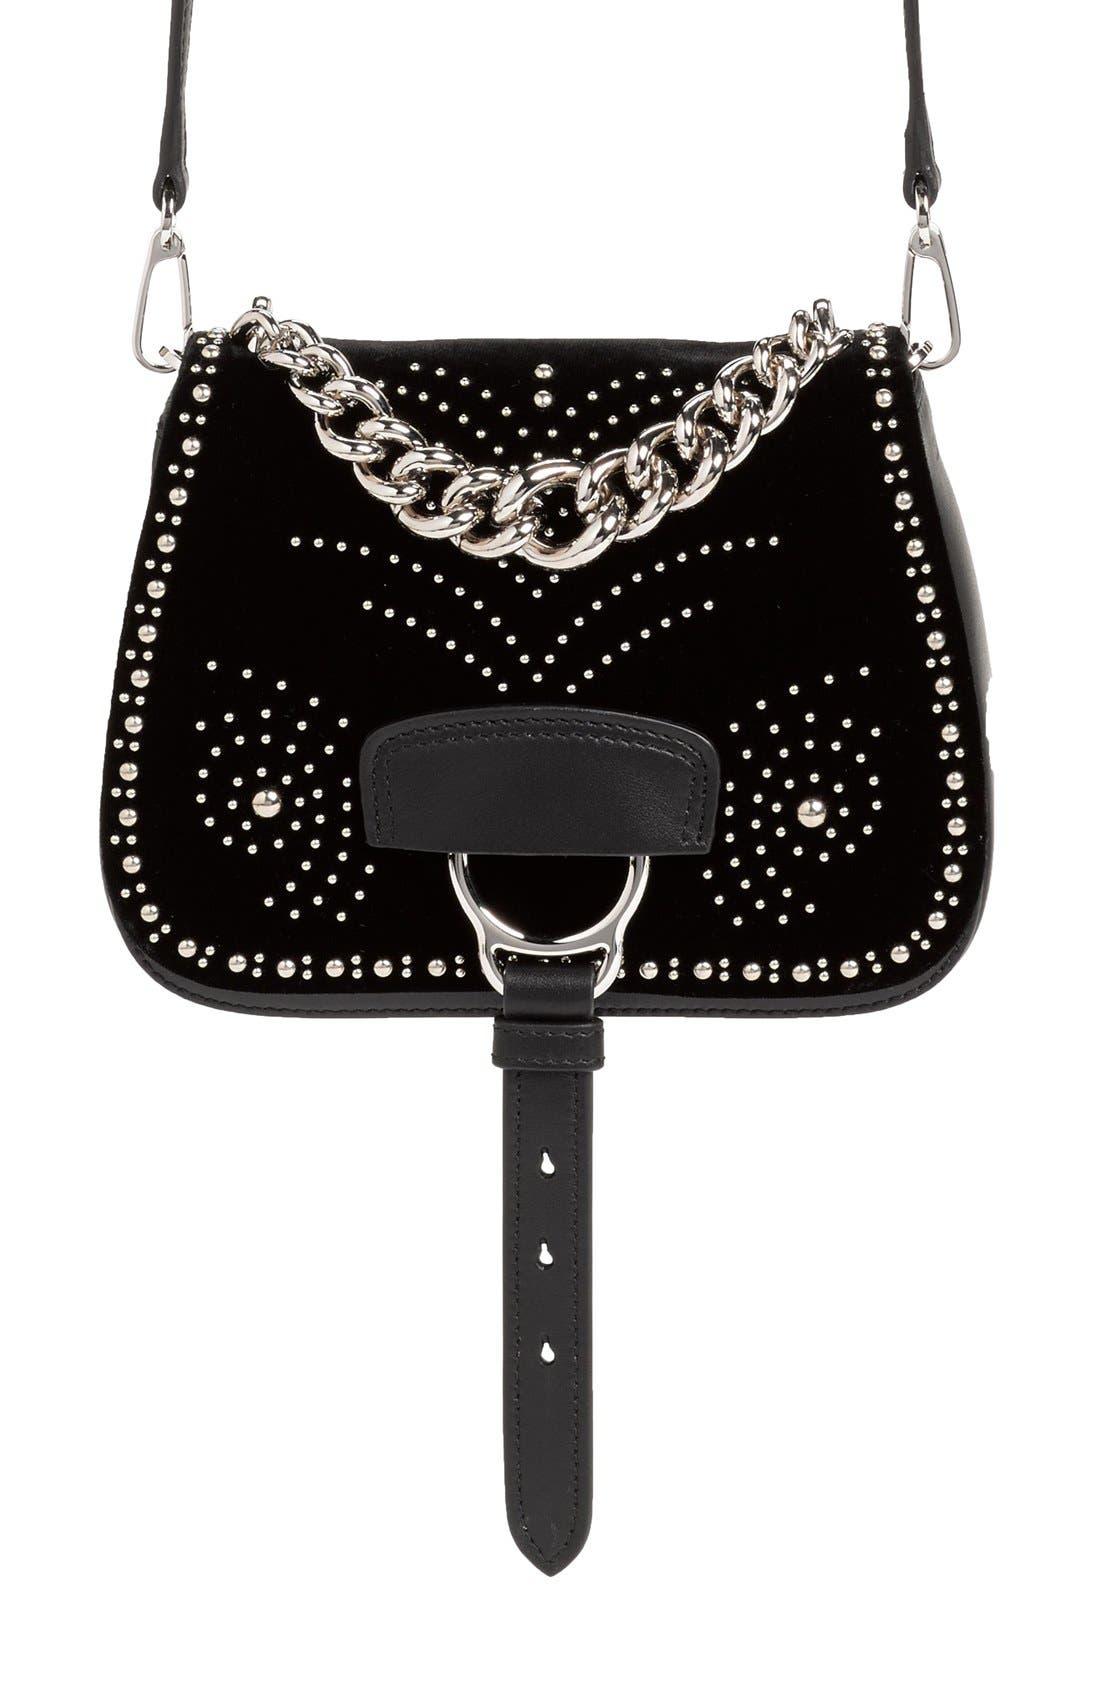 Alternate Image 1 Selected - Miu Miu 'Small Dahlia' Velvet & Calfskin Leather Saddle Bag